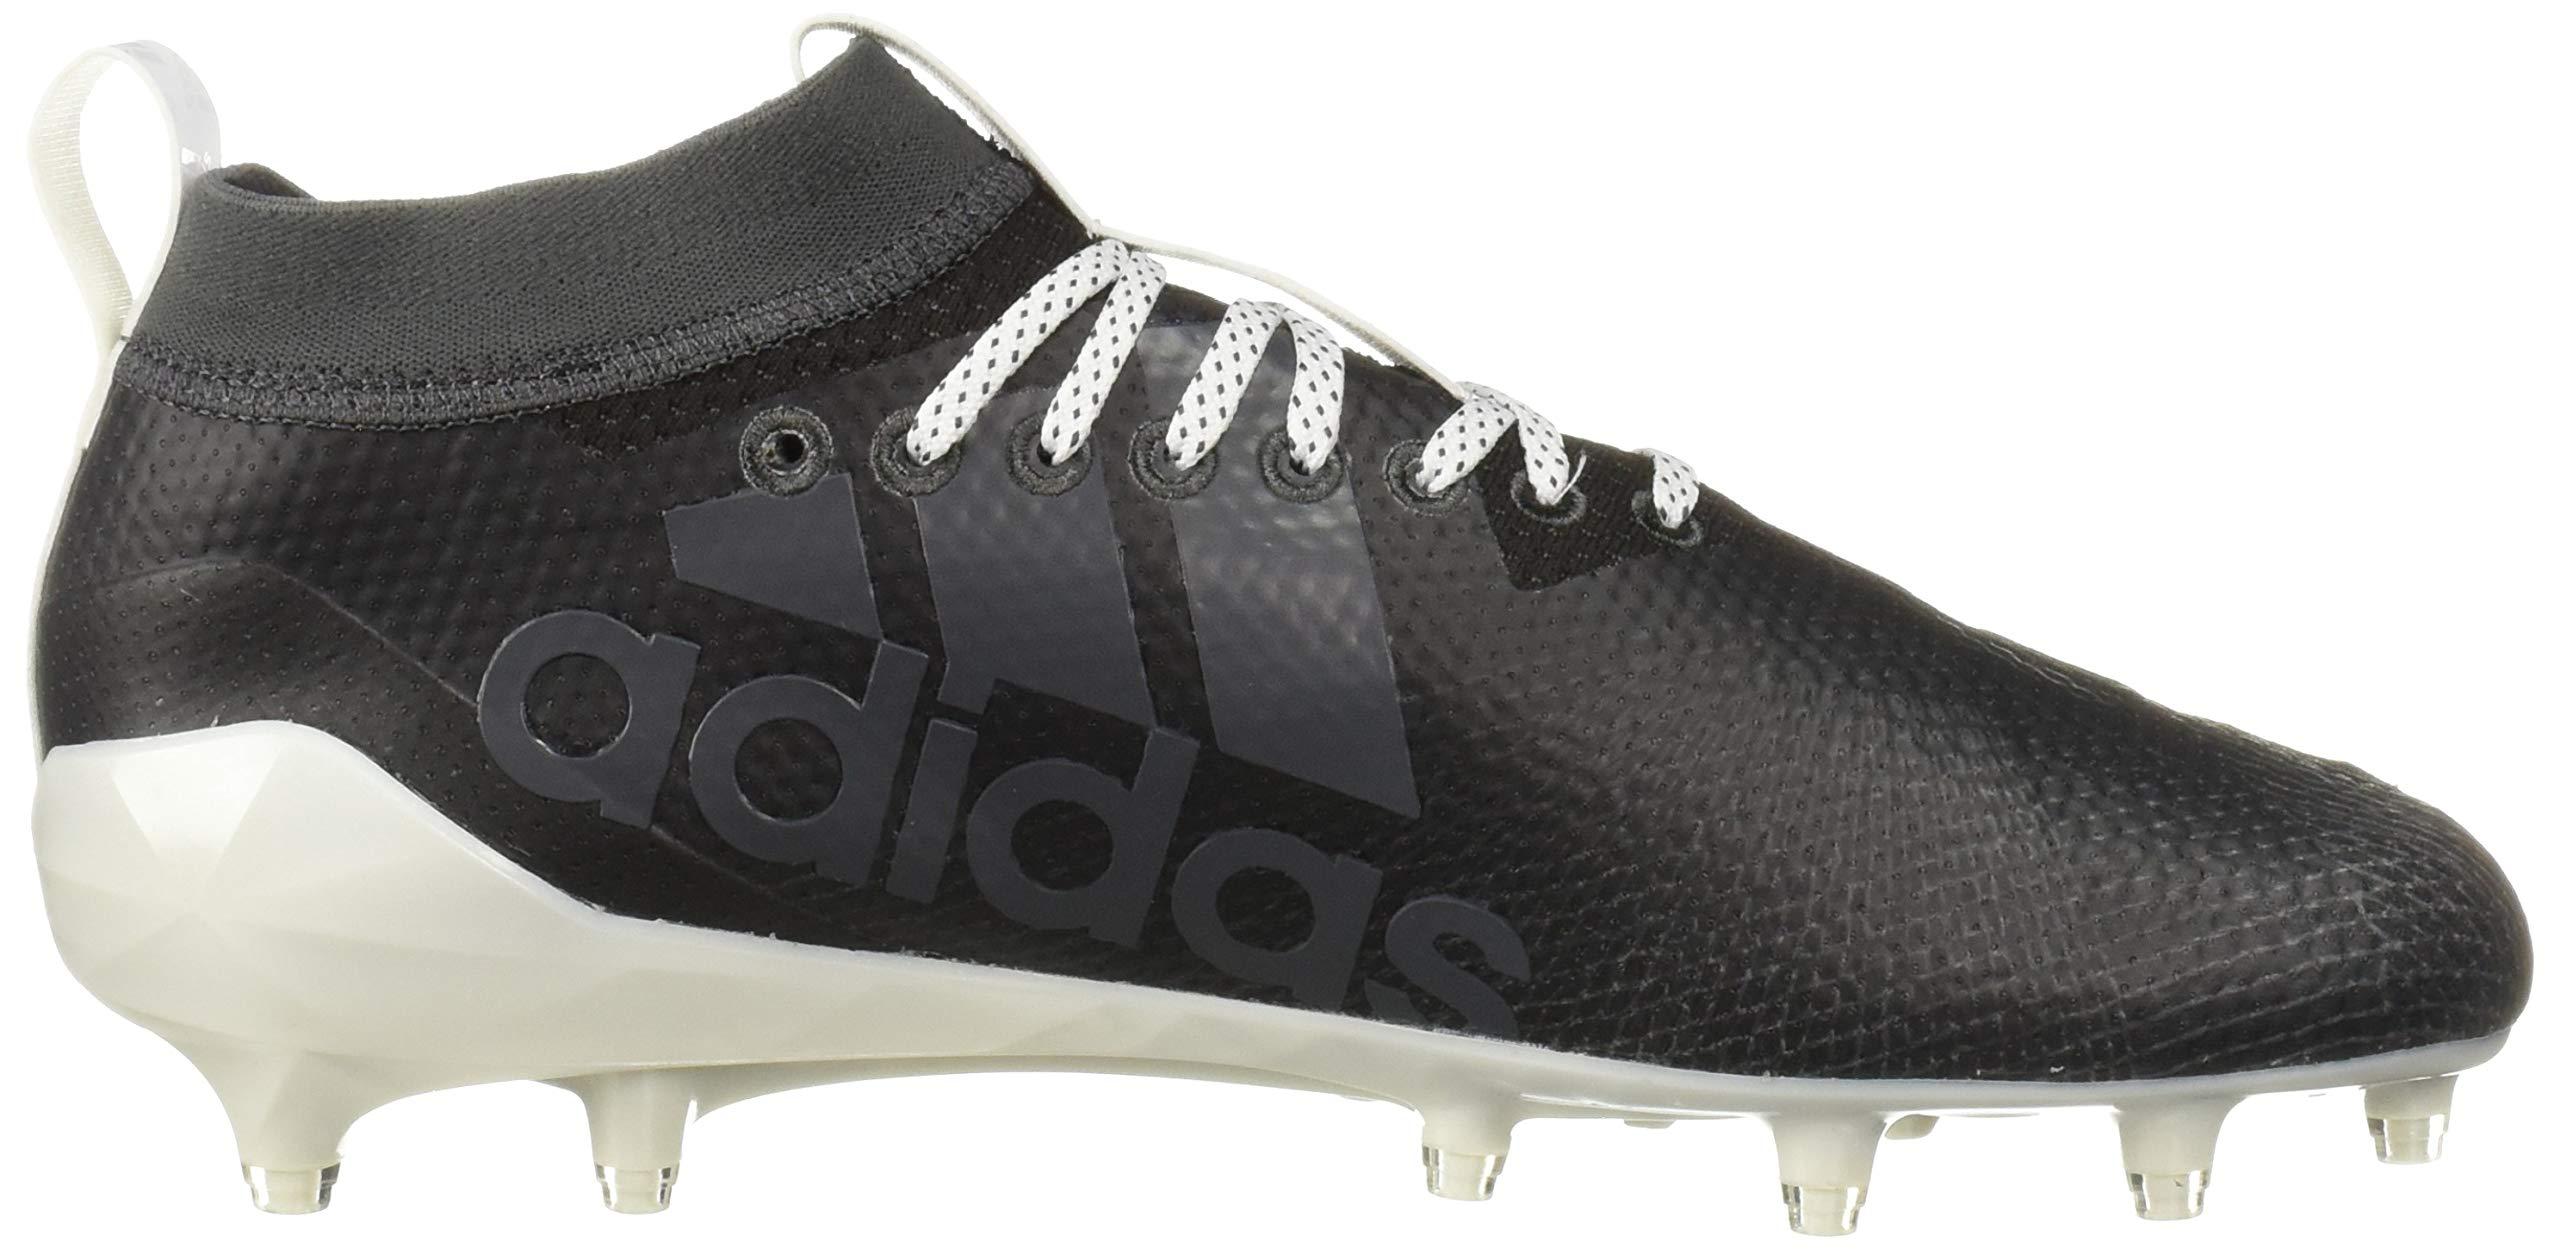 adidas Men's Adizero 8.0 Football Shoe Black/White/Grey 6.5 M US by adidas (Image #7)